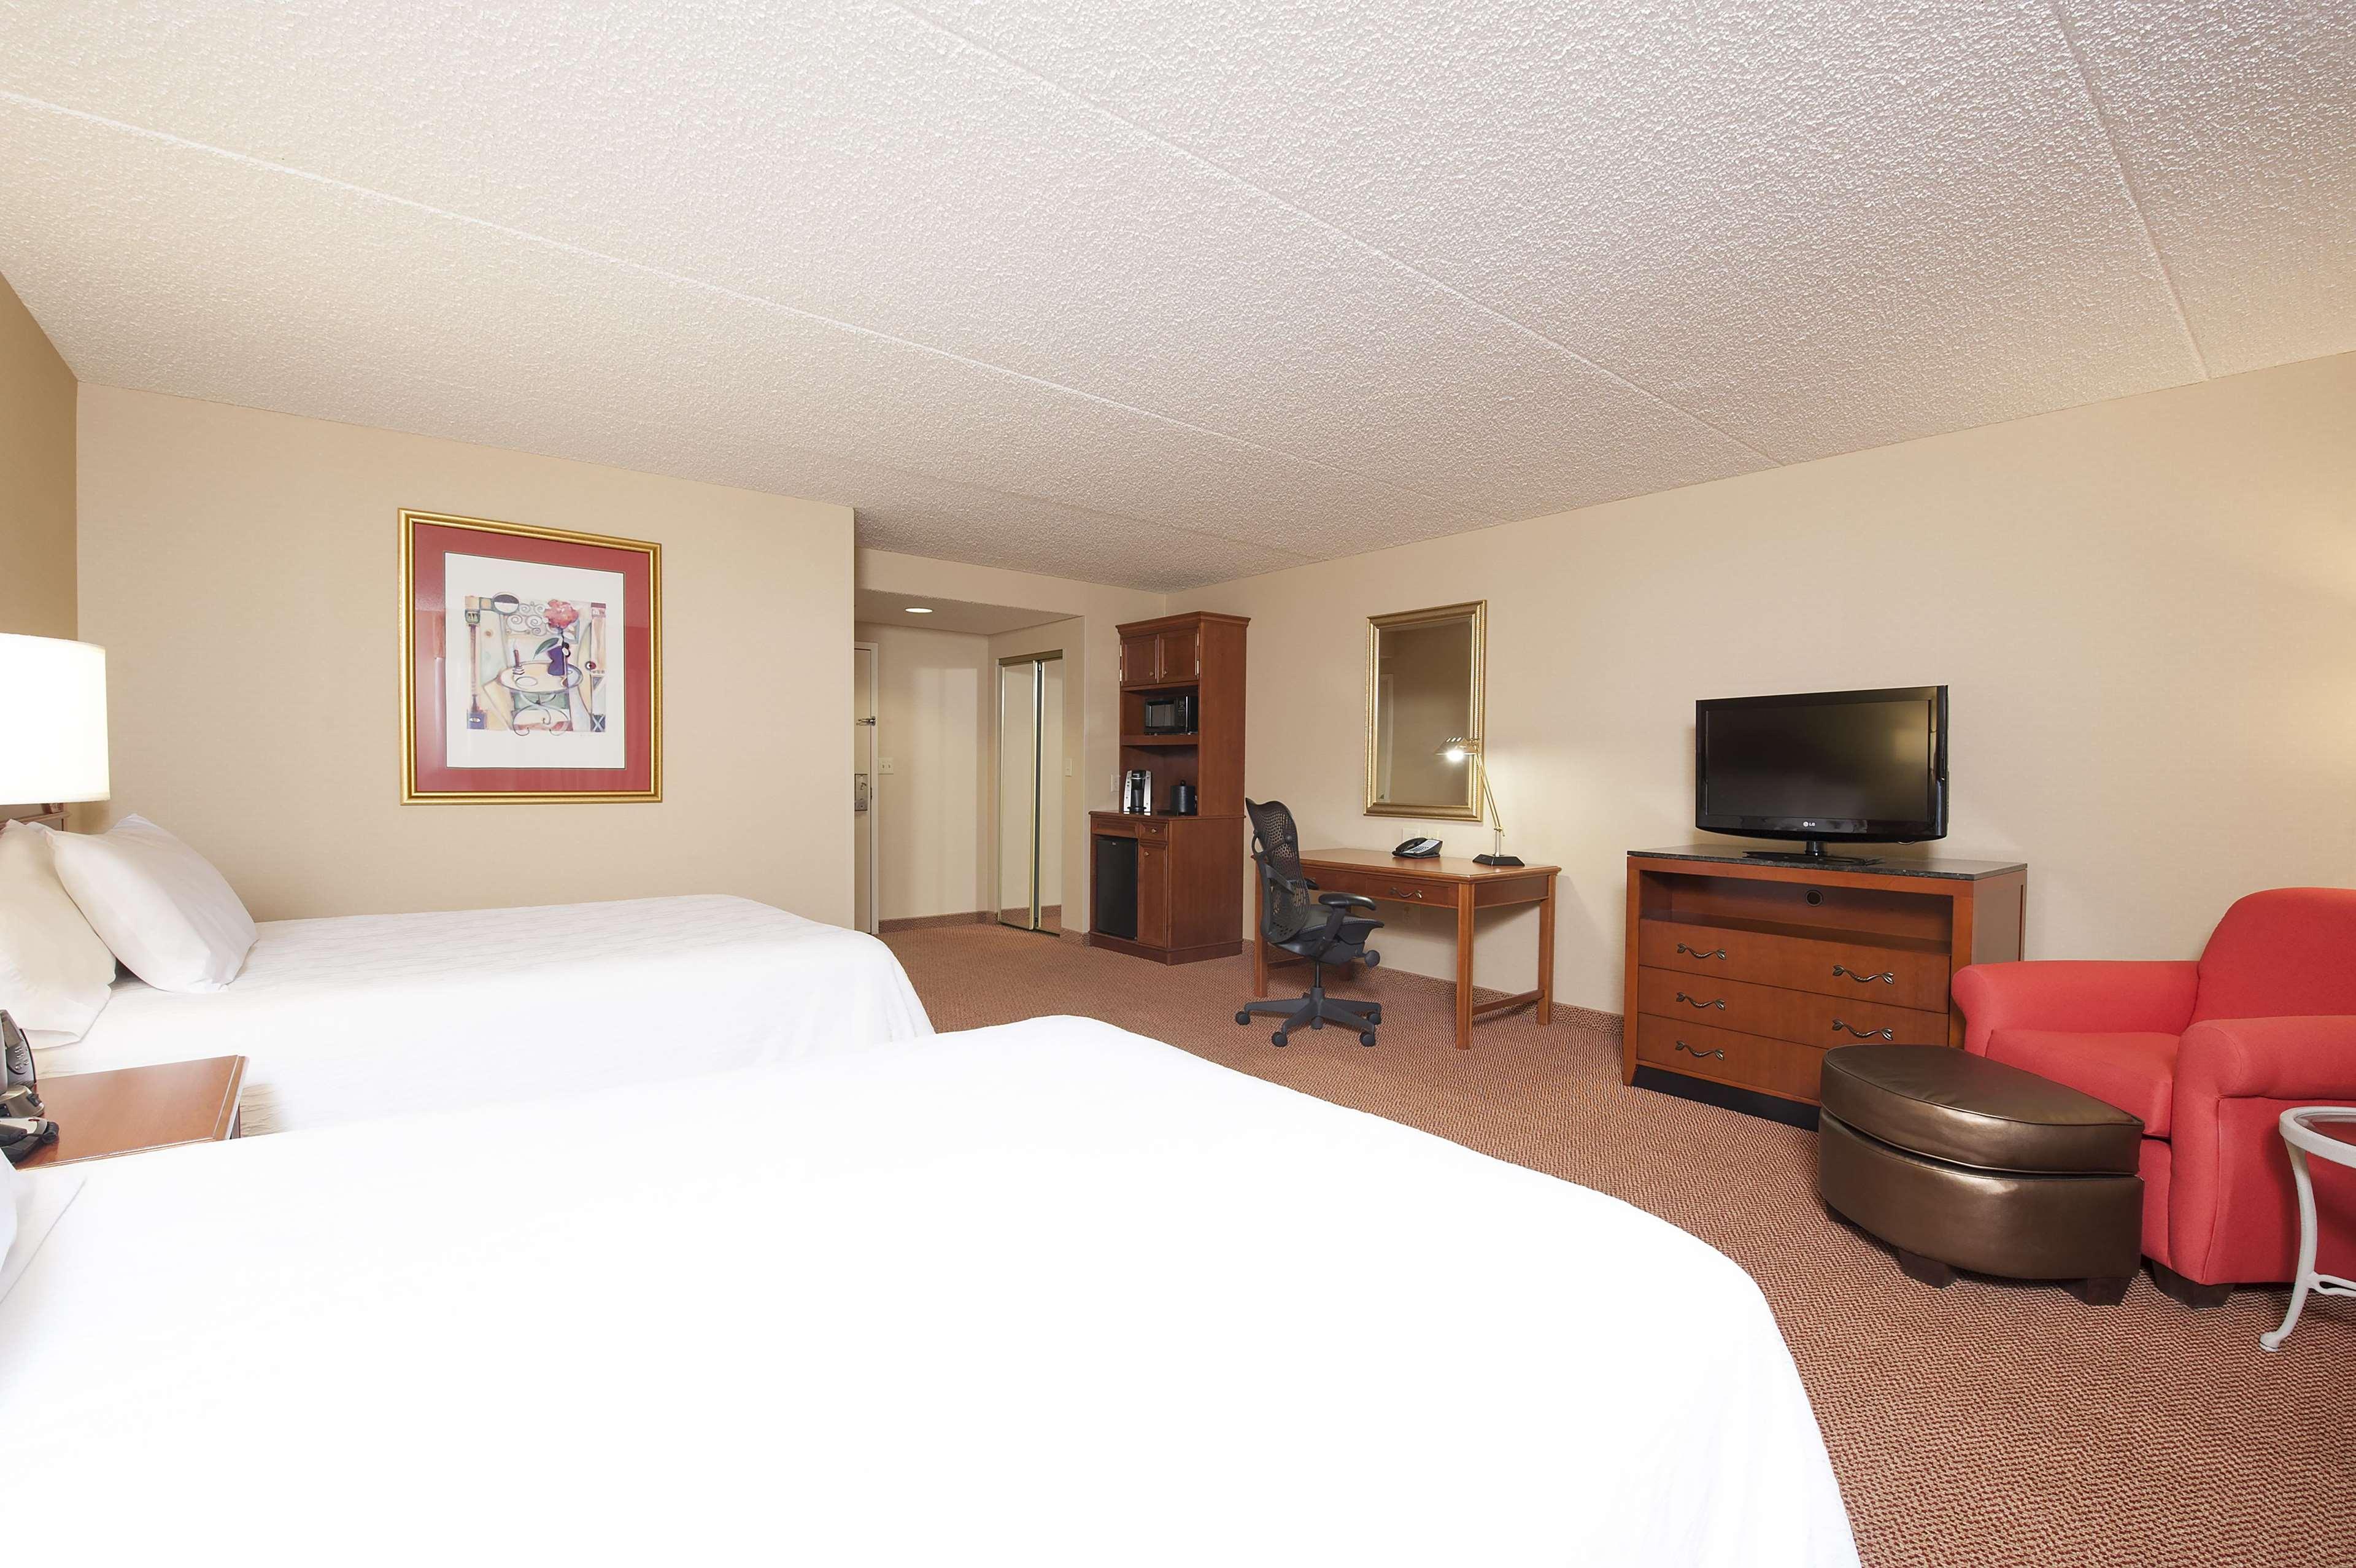 Hilton Garden Inn West Lafayette Wabash Landing image 37